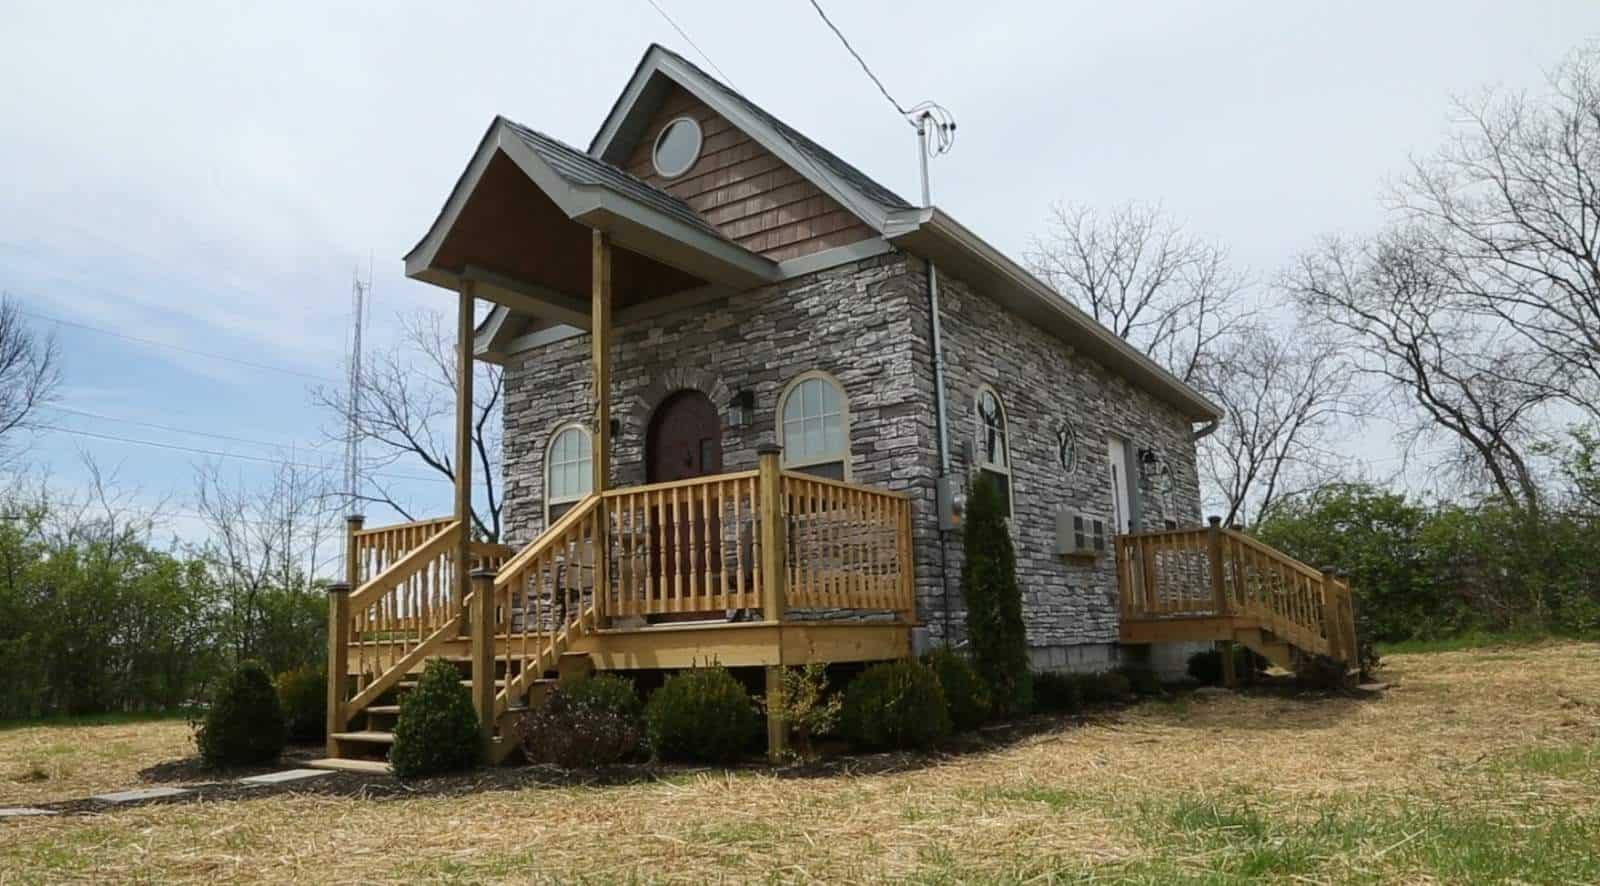 Tiny House Plans: Tiny House Nation's Downsized Gothic Castle